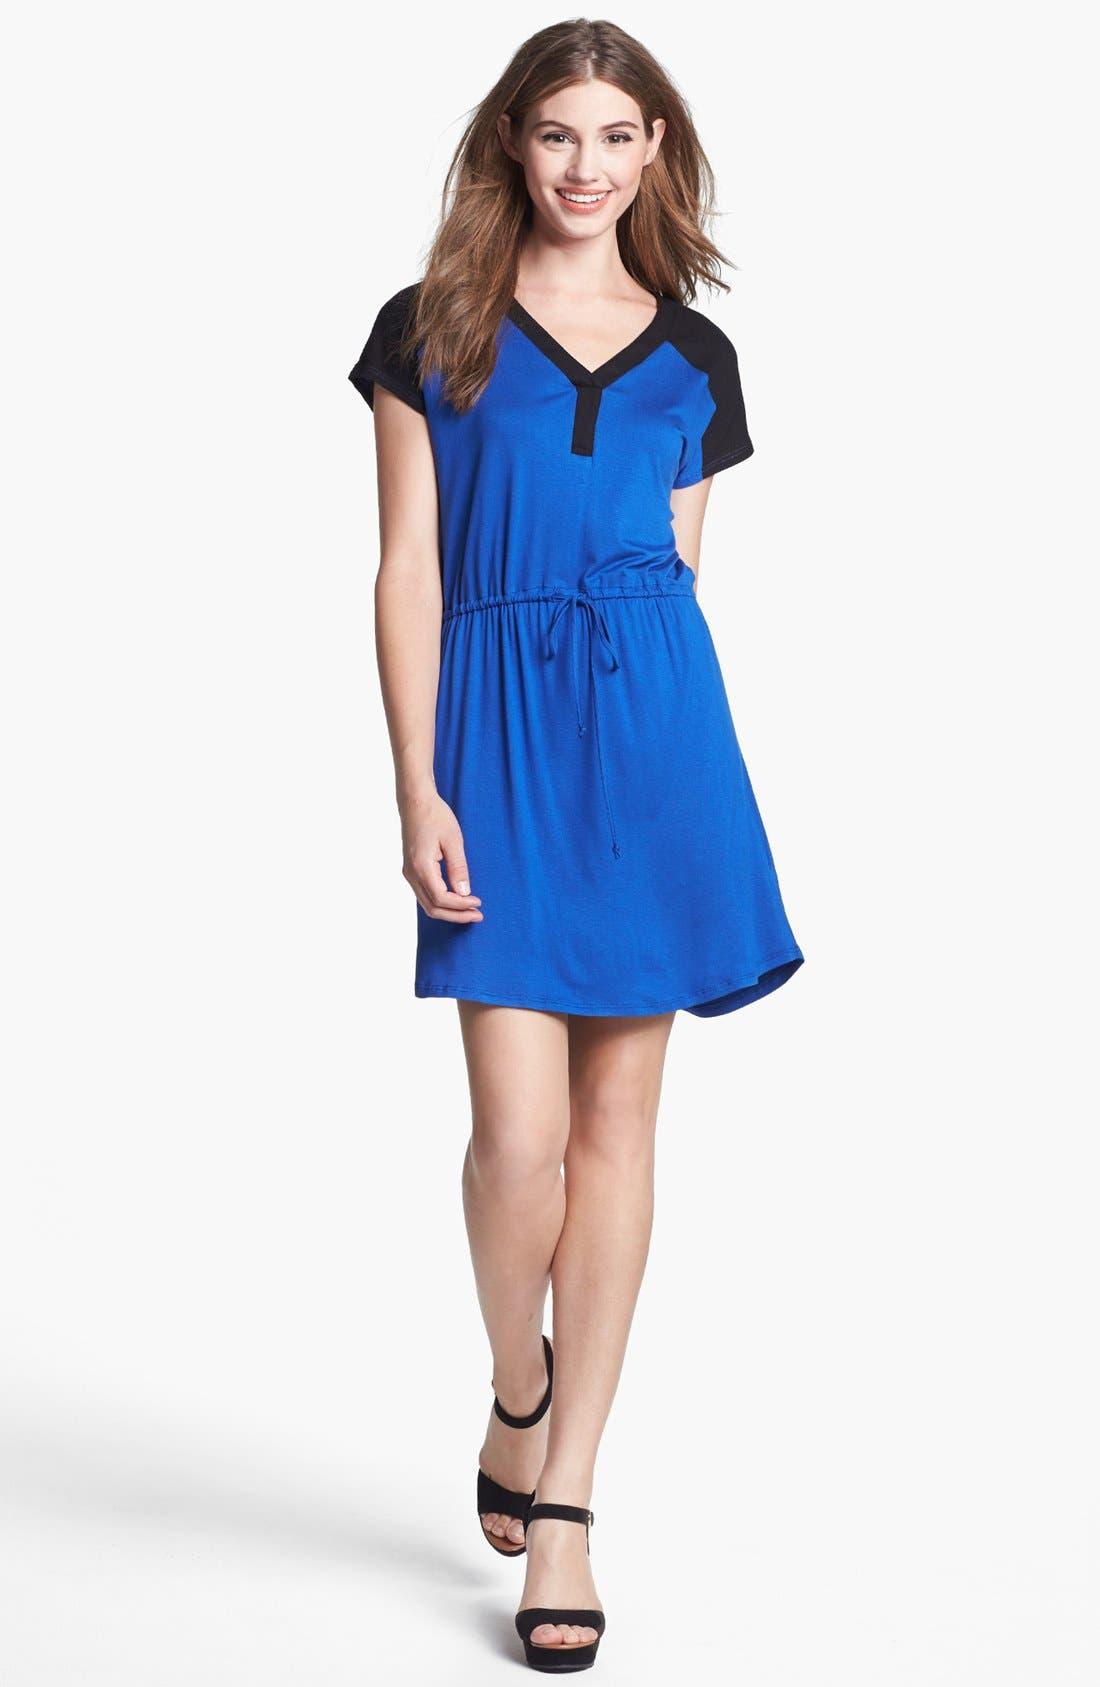 Alternate Image 1 Selected - Olivia Moon Contrast Yoke Drawstring Dress (Regular & Petite)